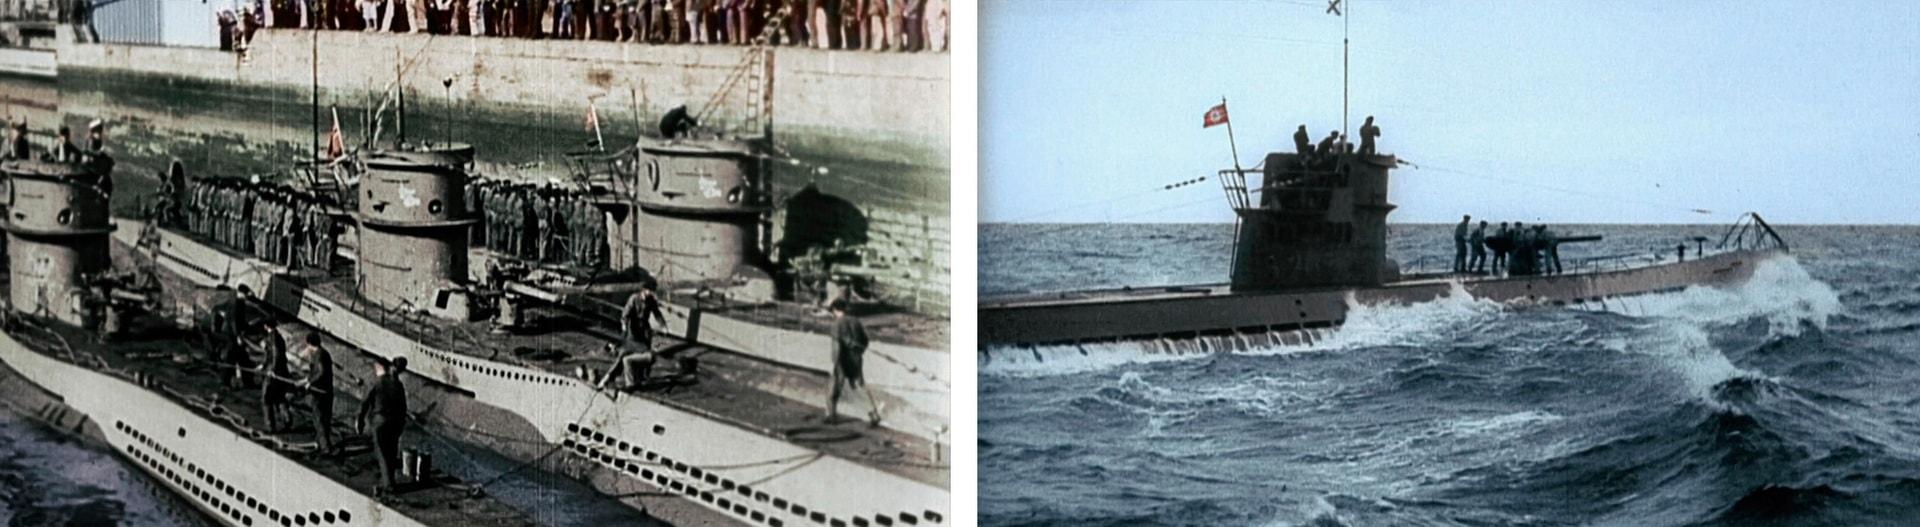 Битва за Атлантику 1939-1945 г.г.